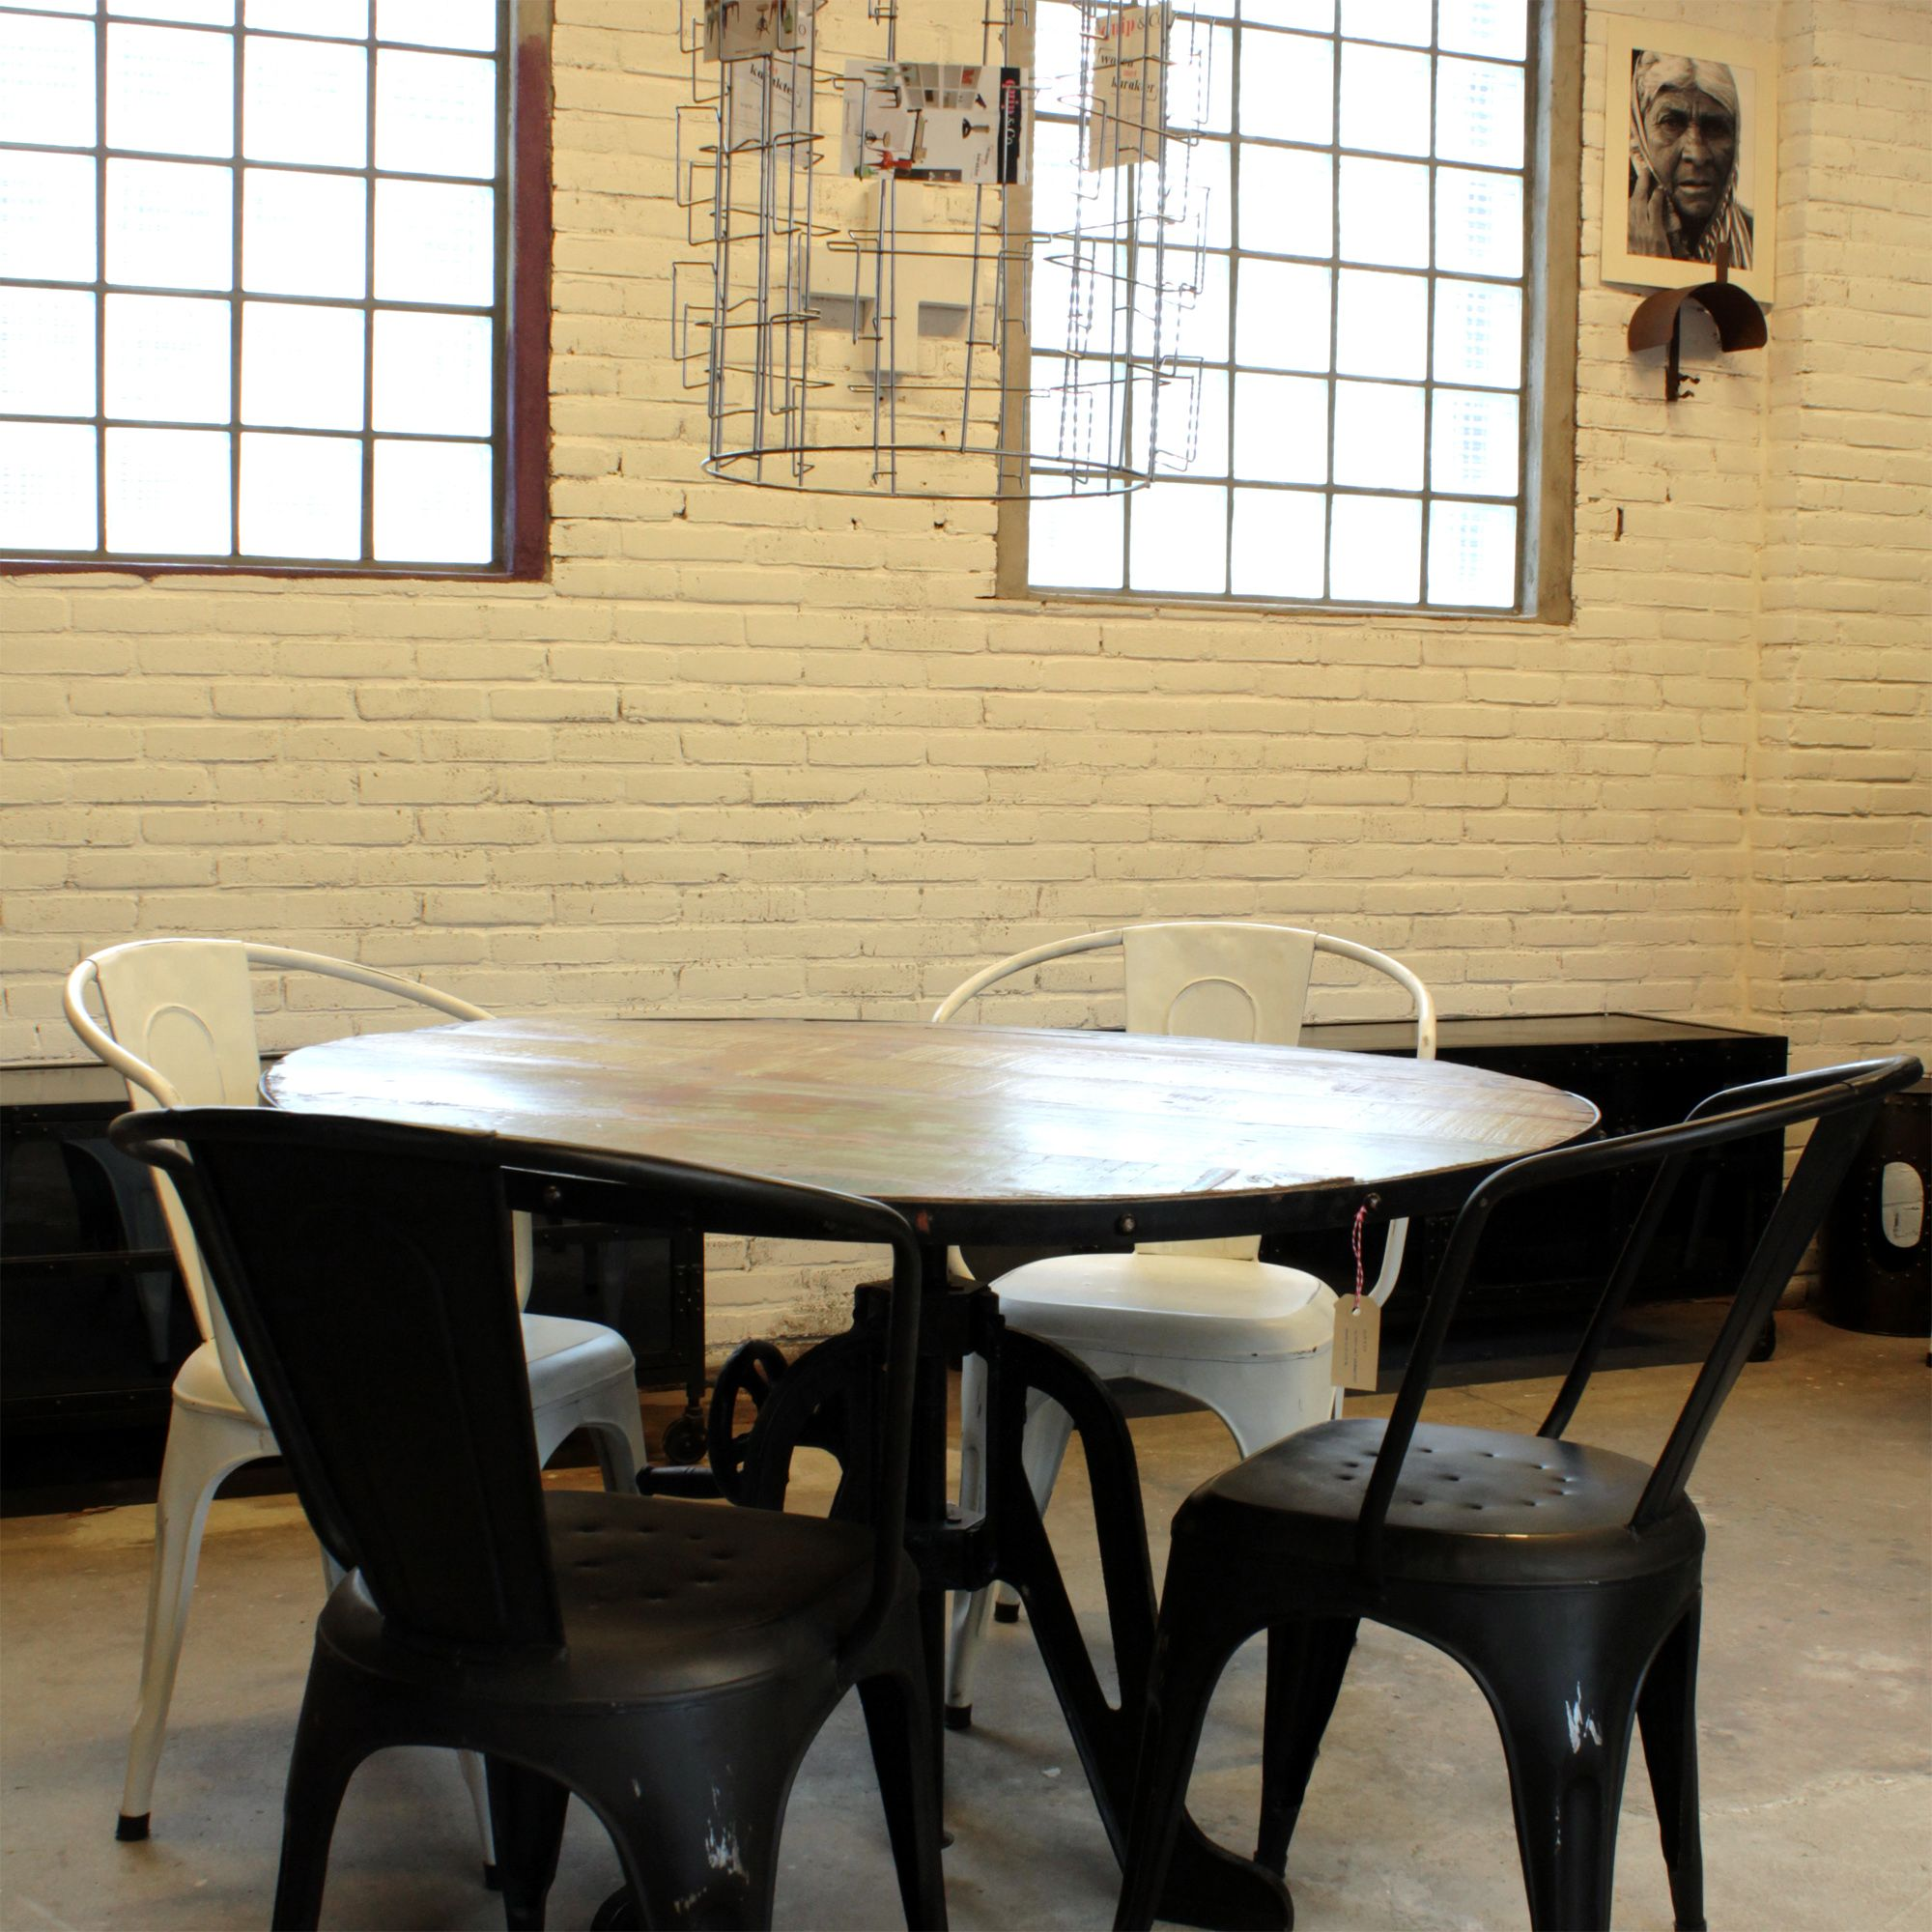 chic industrial furniture. INDUSTRIAL FURNITURE QUIP \u0026 CO Chic Industrial Furniture